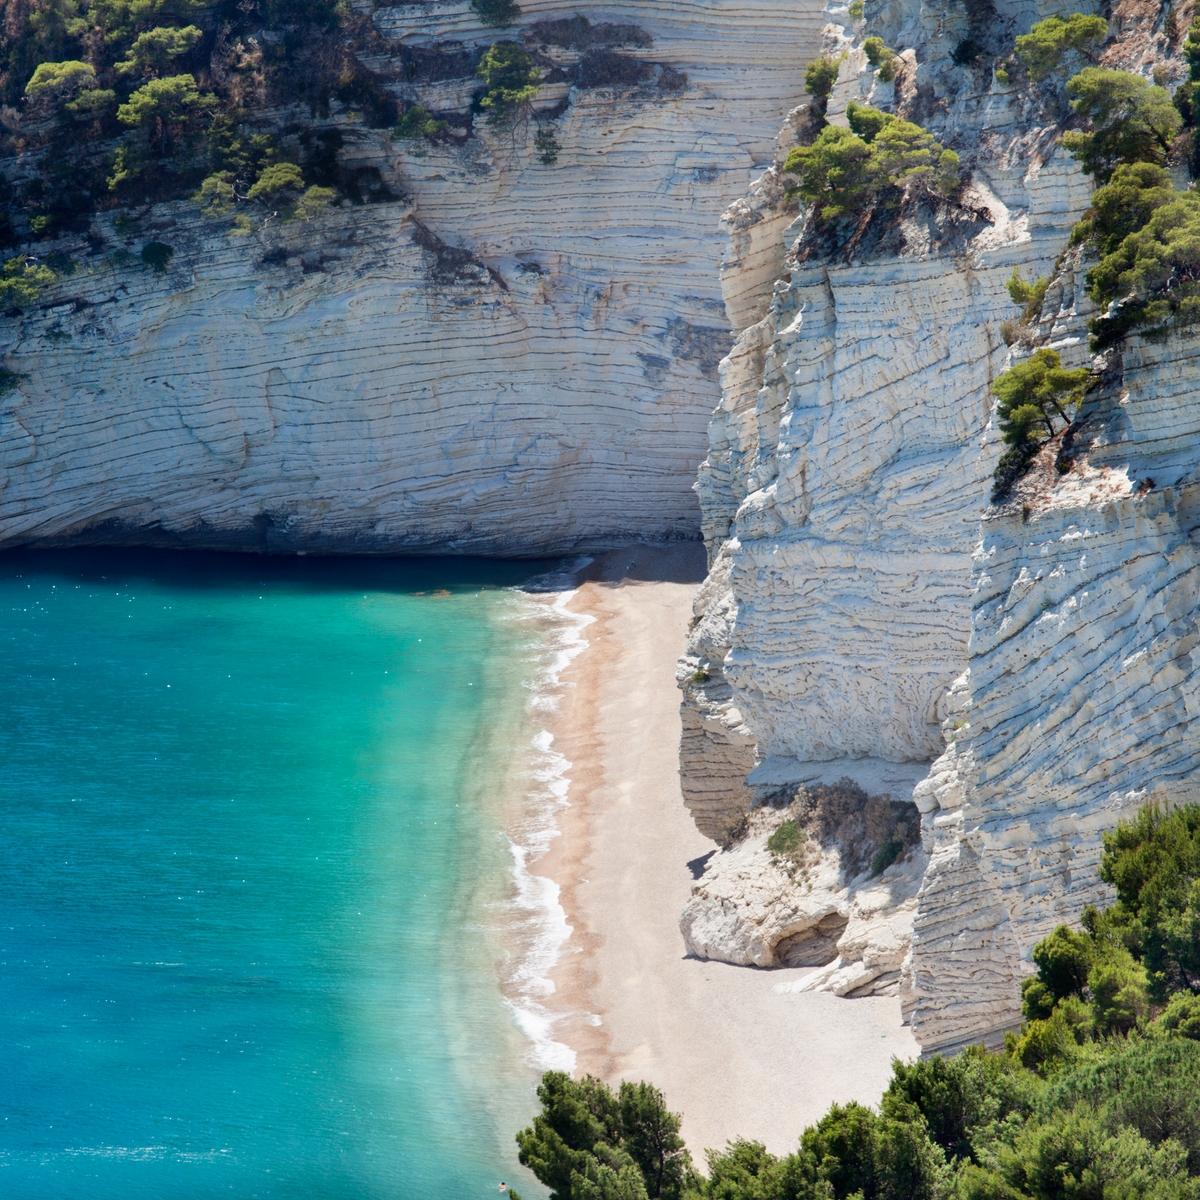 Spiagge del Gargano: Baia delle Zagare Gargano